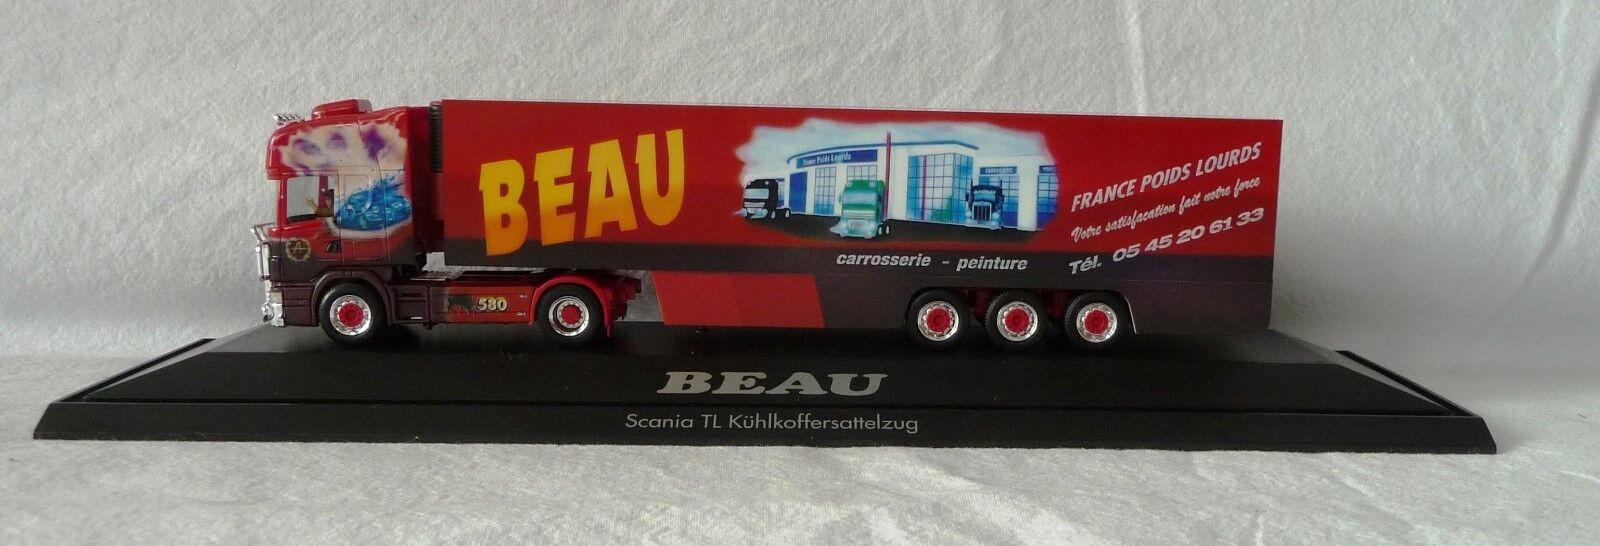 Herpa H0 120838  Scania TL Kühlkoffer-Sattelzug  Beau II  (F), PC  | Kompletter Spezifikationsbereich